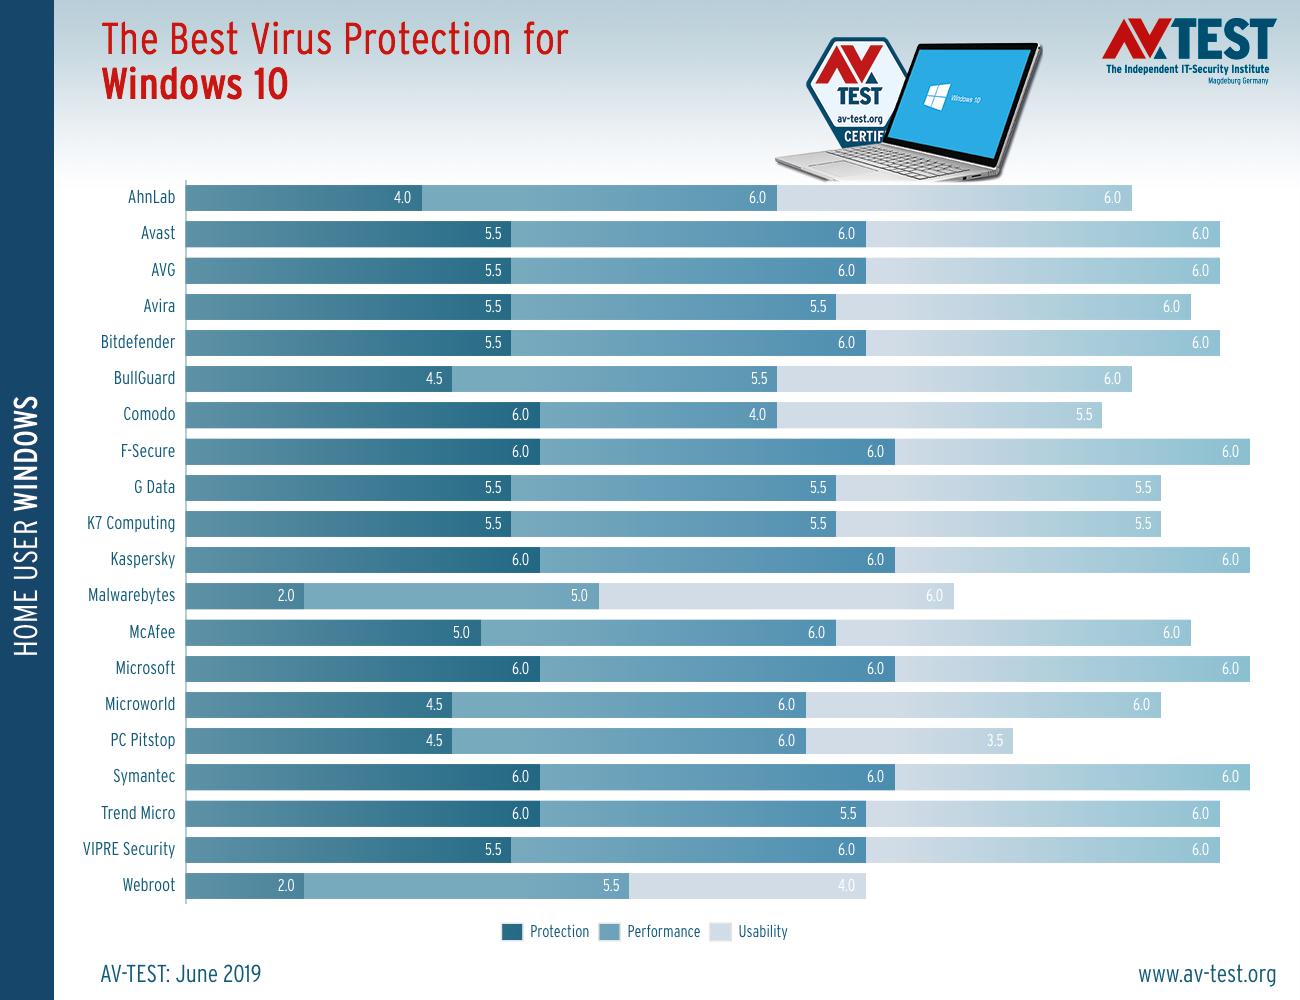 To Windows Defender της Microsoft είναι πλέον μια από τις καλύτερες εφαρμογές antivirus στον κόσμο Micros15